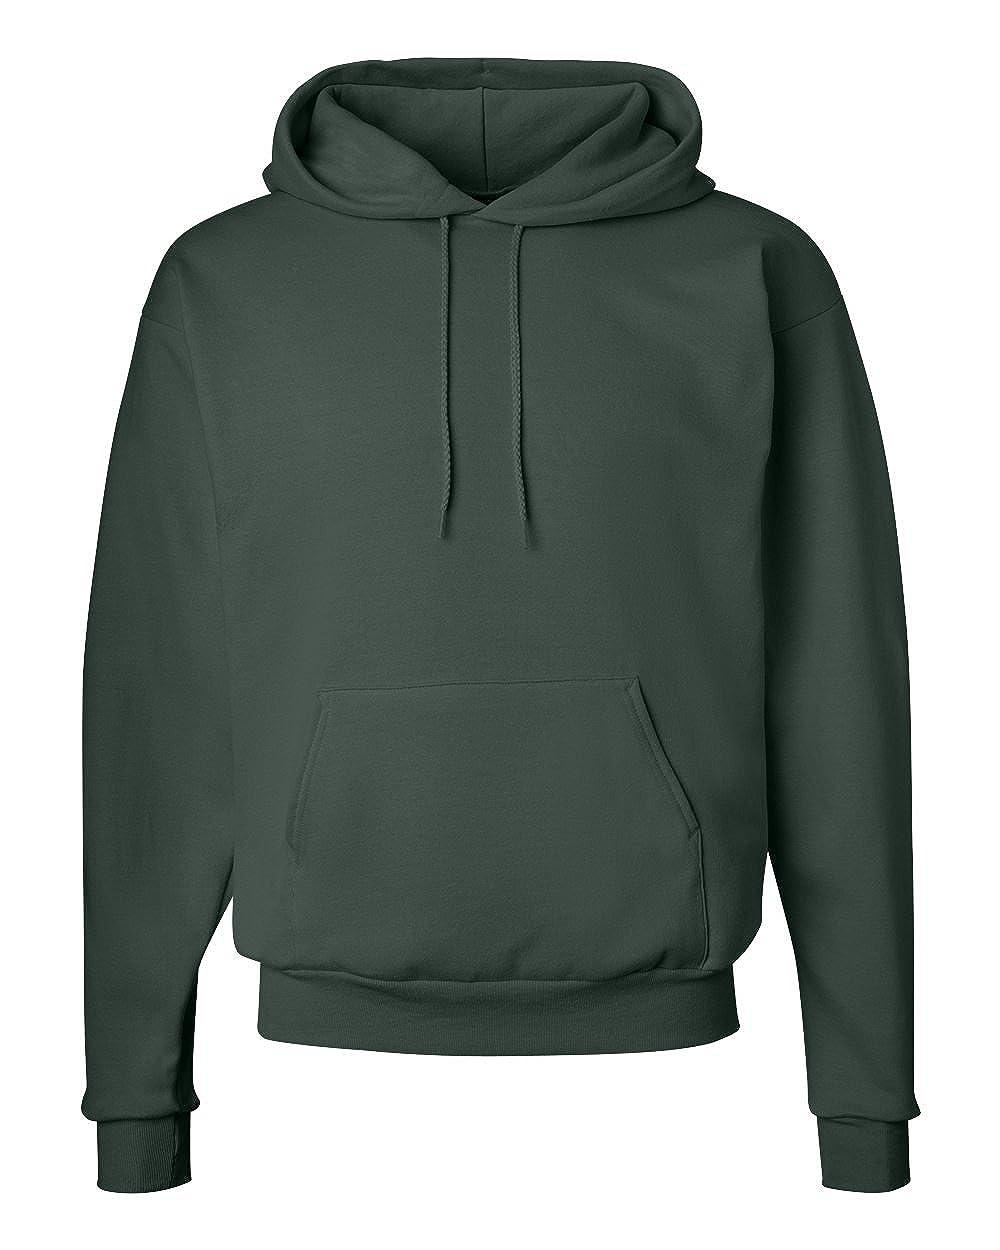 Hanes by ComfortBlend EcoSmart Pullover Hoodie Sweatshirt